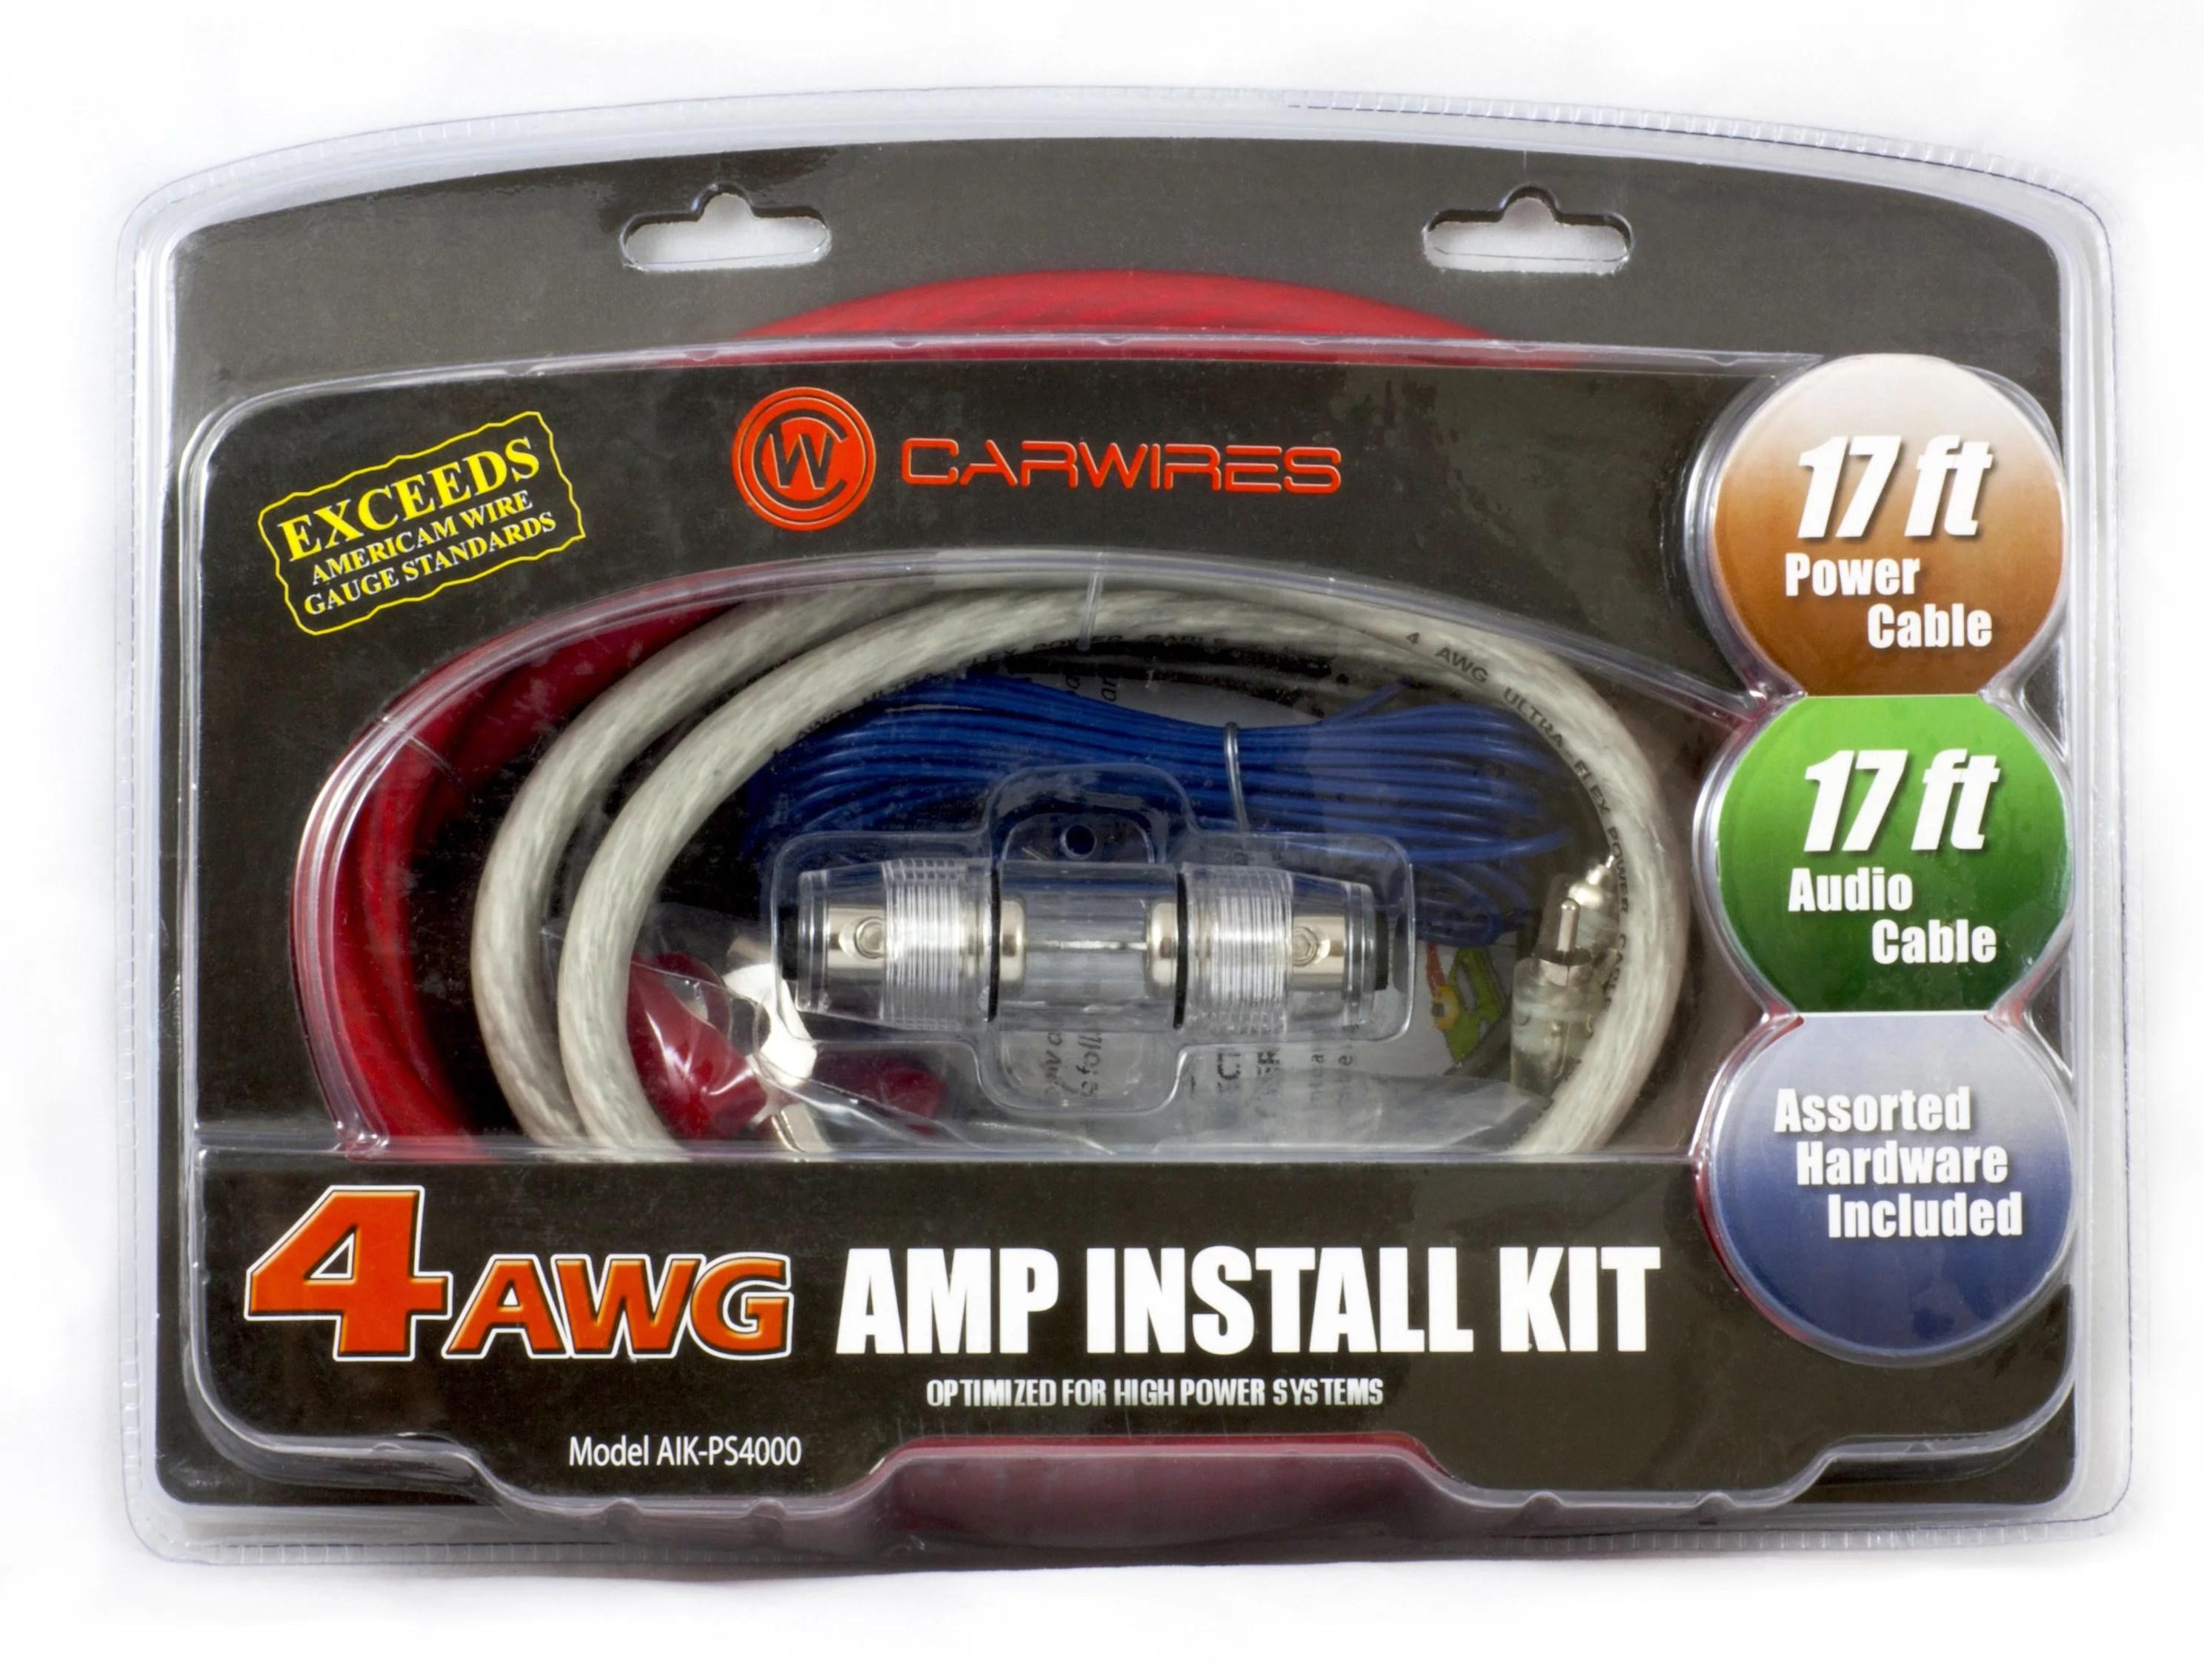 hight resolution of carwires aik ps4000 4 awg amplifier wiring kit walmart com car audio wiring kit walmart